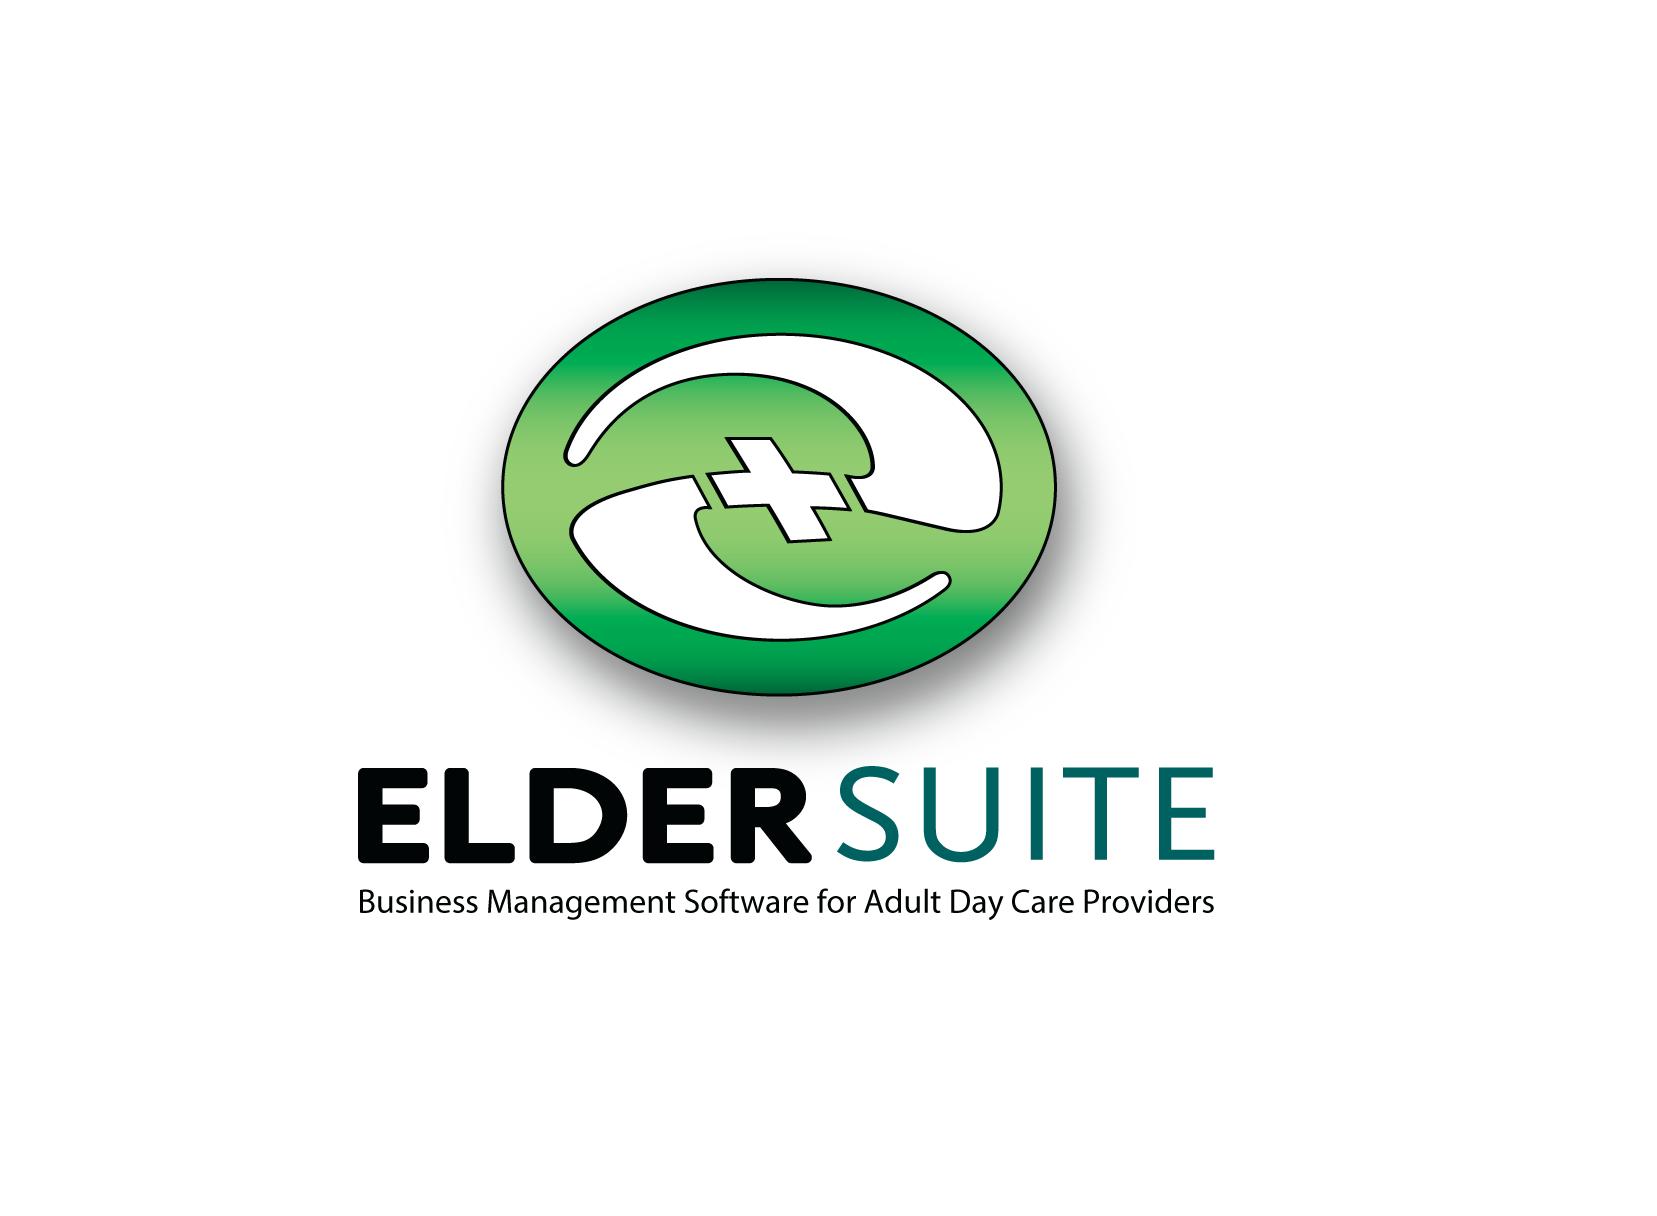 ElderSuite logo